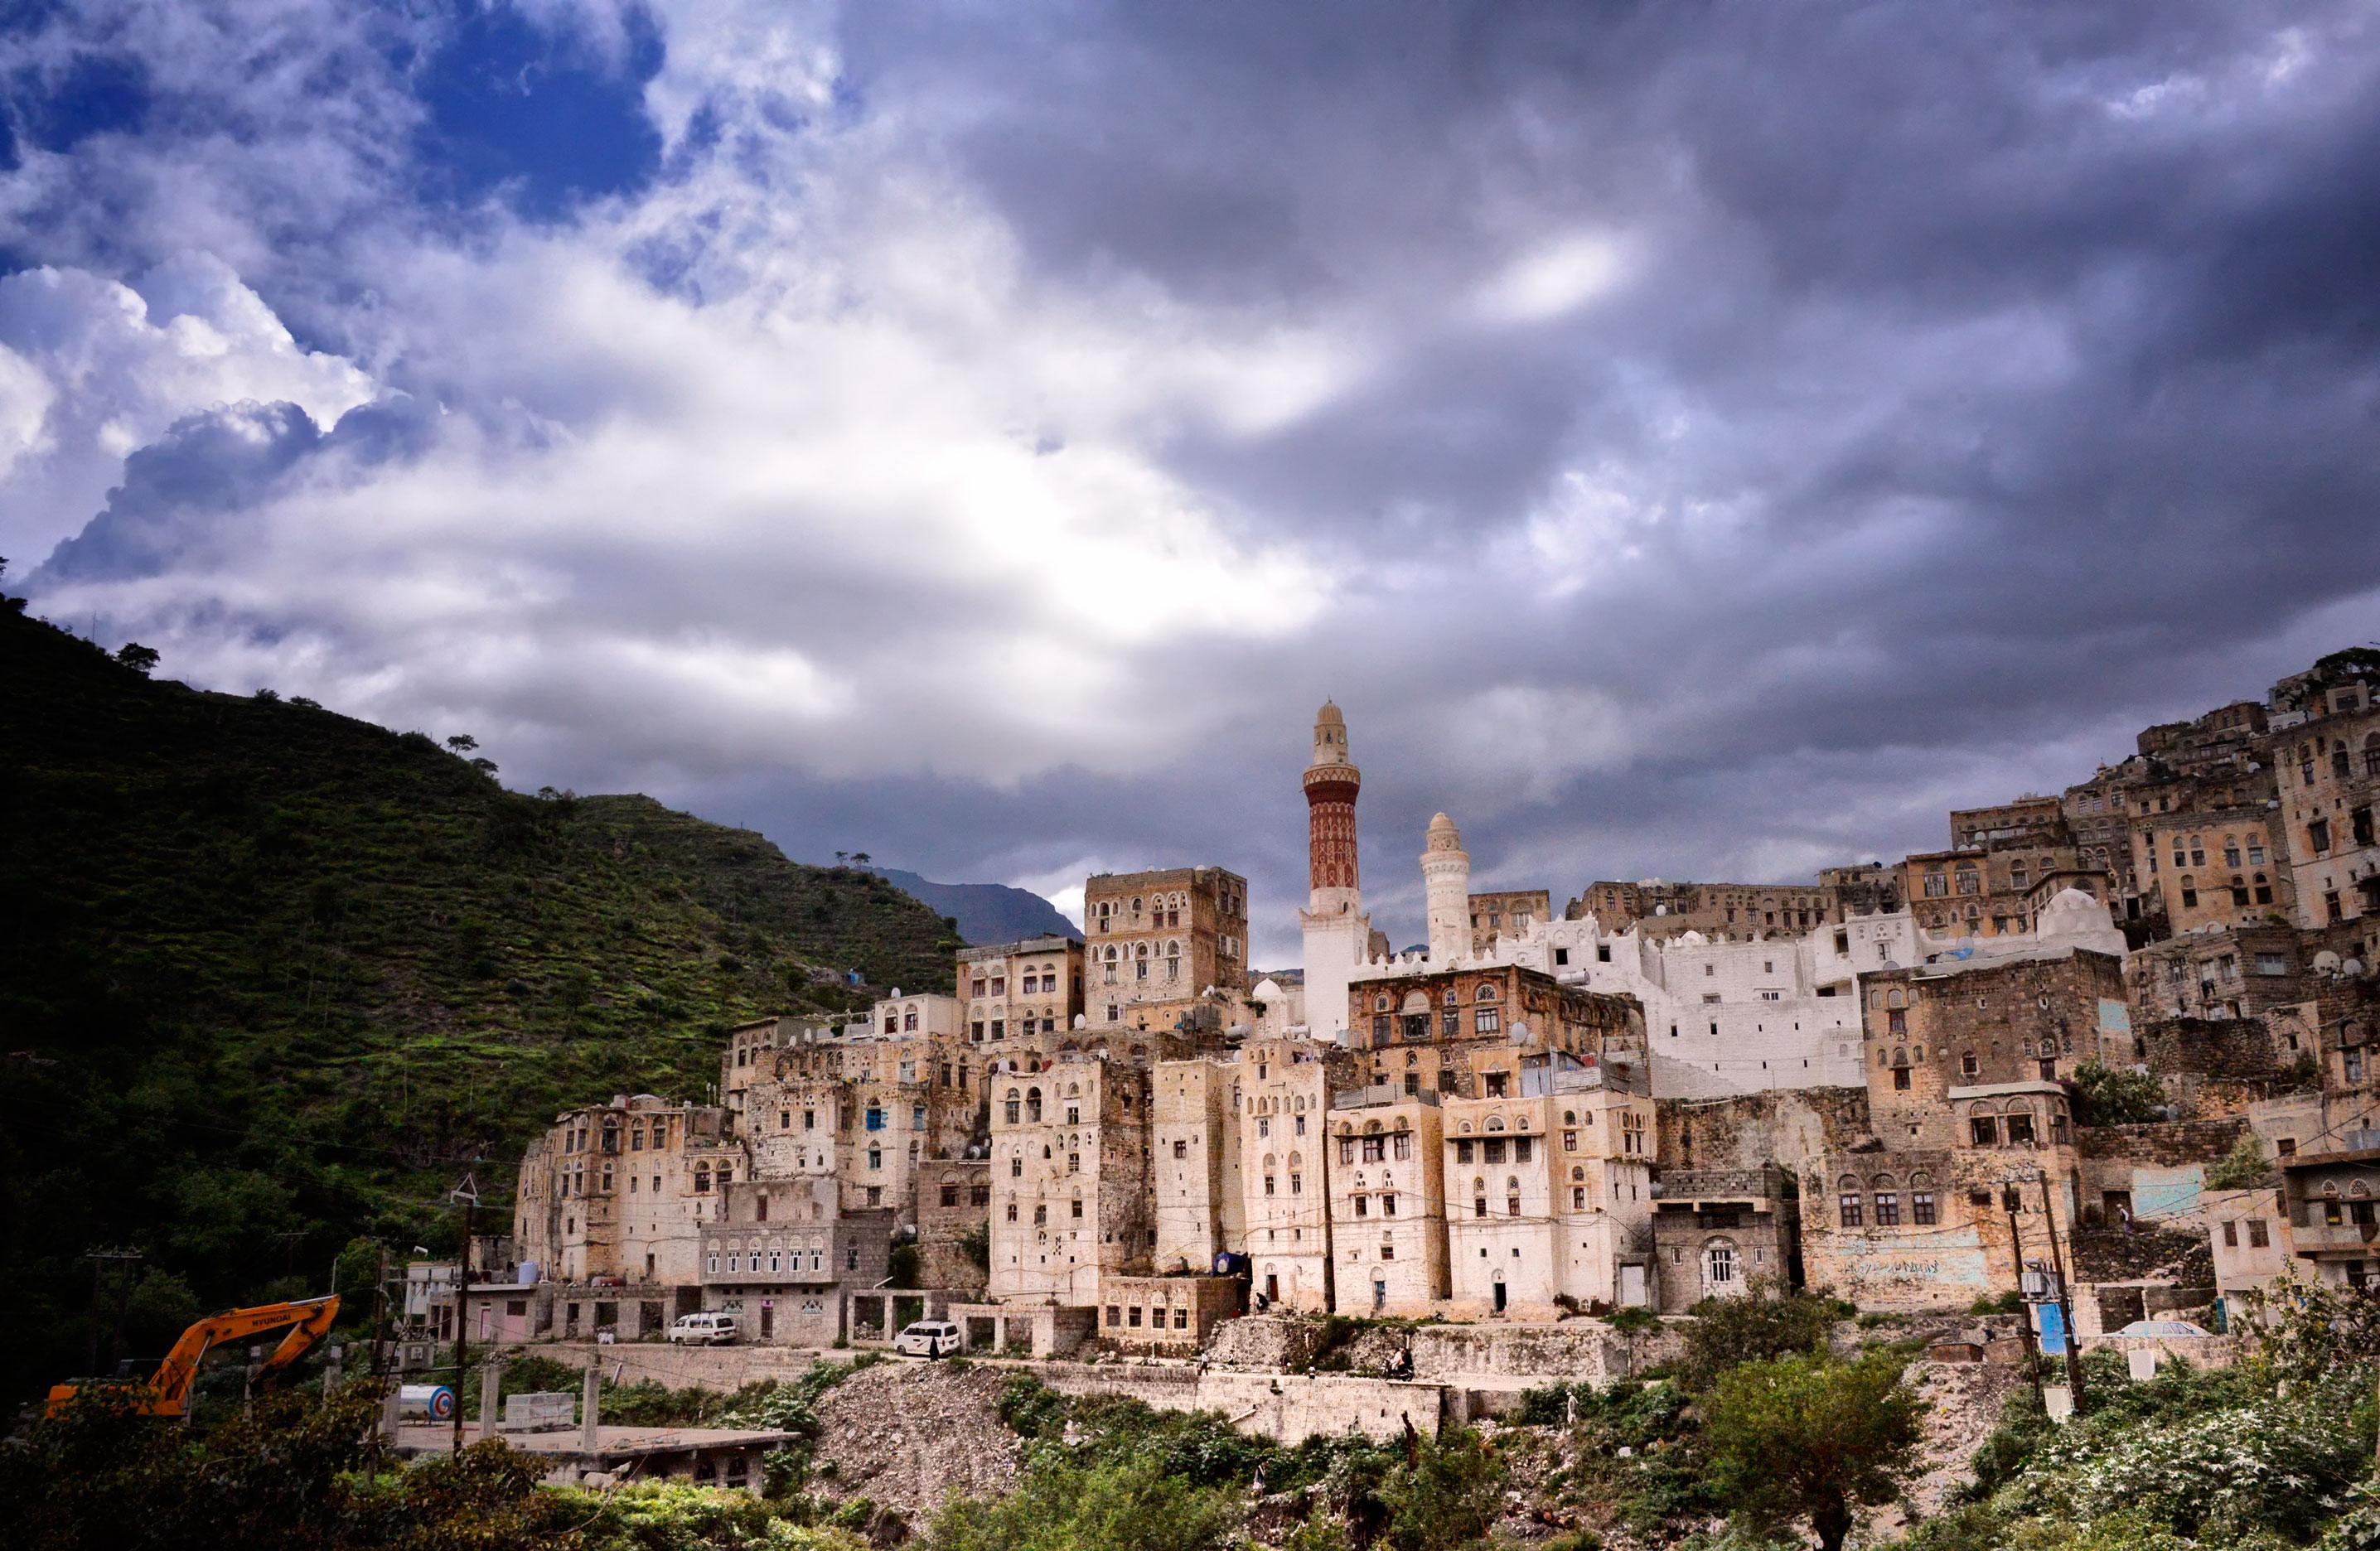 Jibla%2C_Yemen_%2814262696121%29.jpg